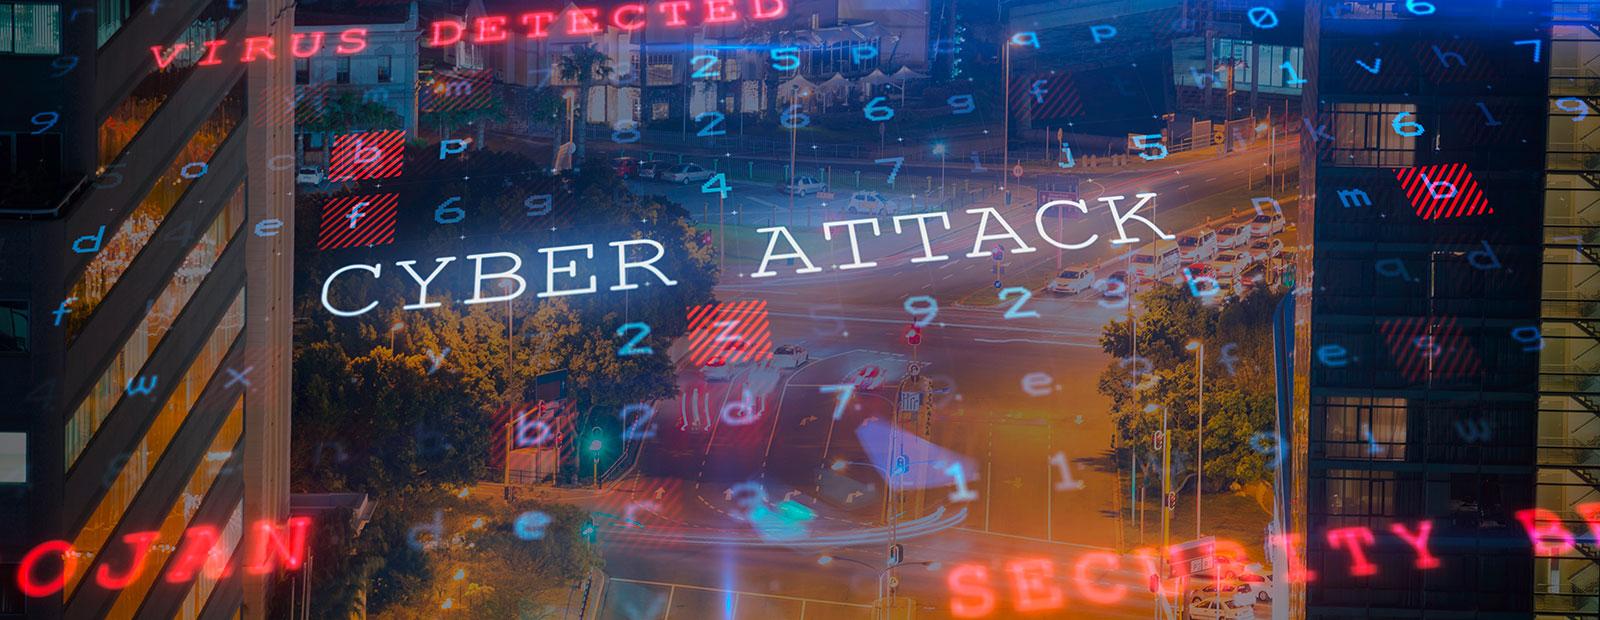 cyber attack grafik